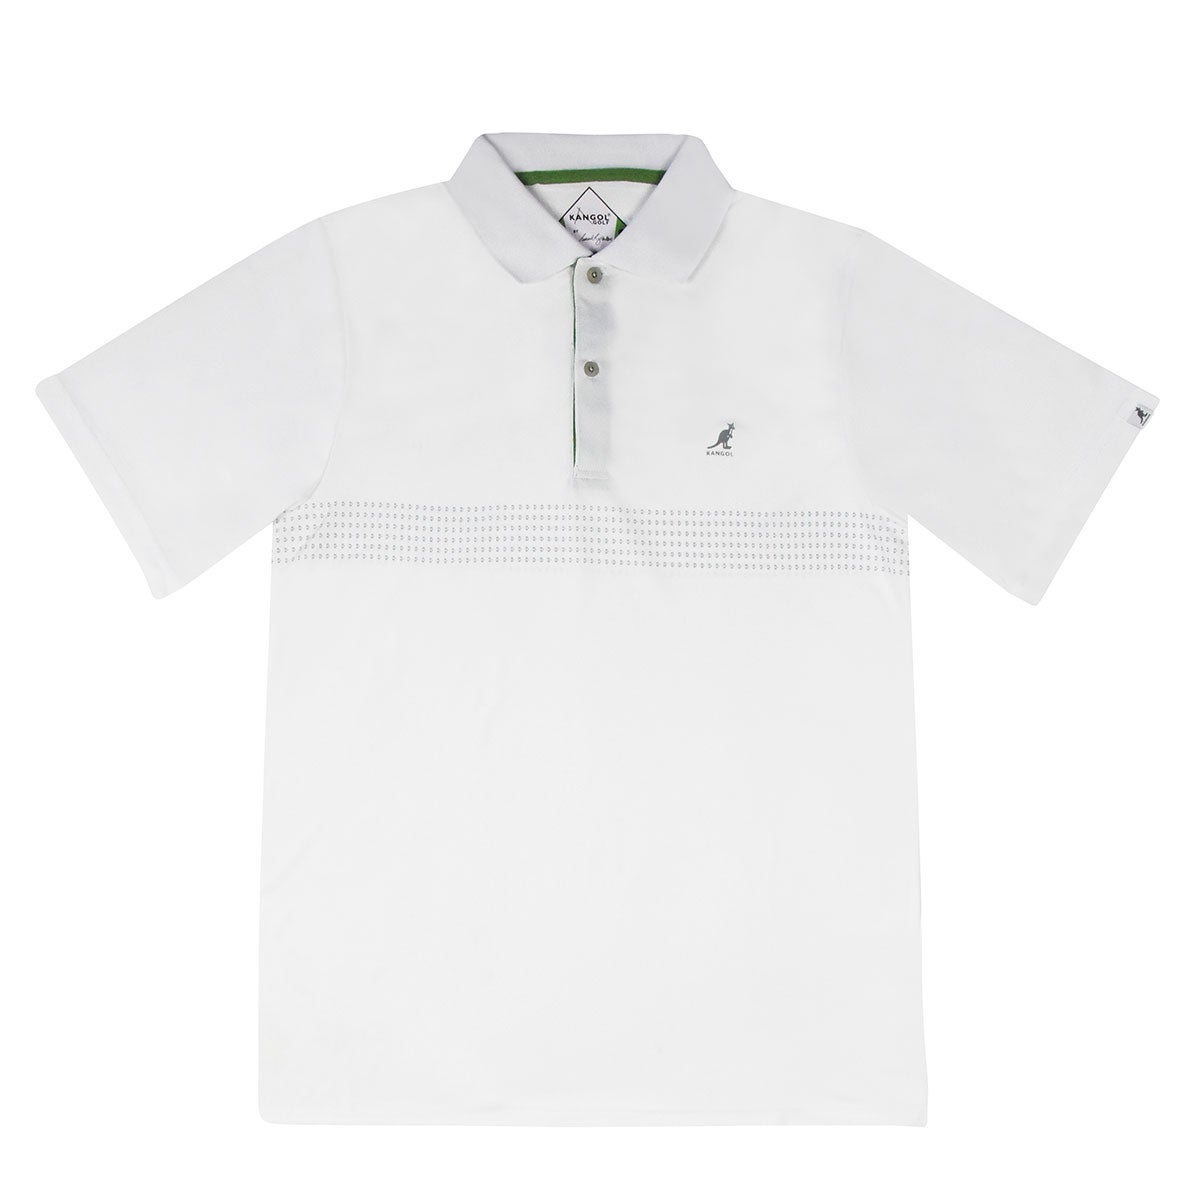 Kangol Samuel L. Jackson Golf Ventair Polo Shirt in White